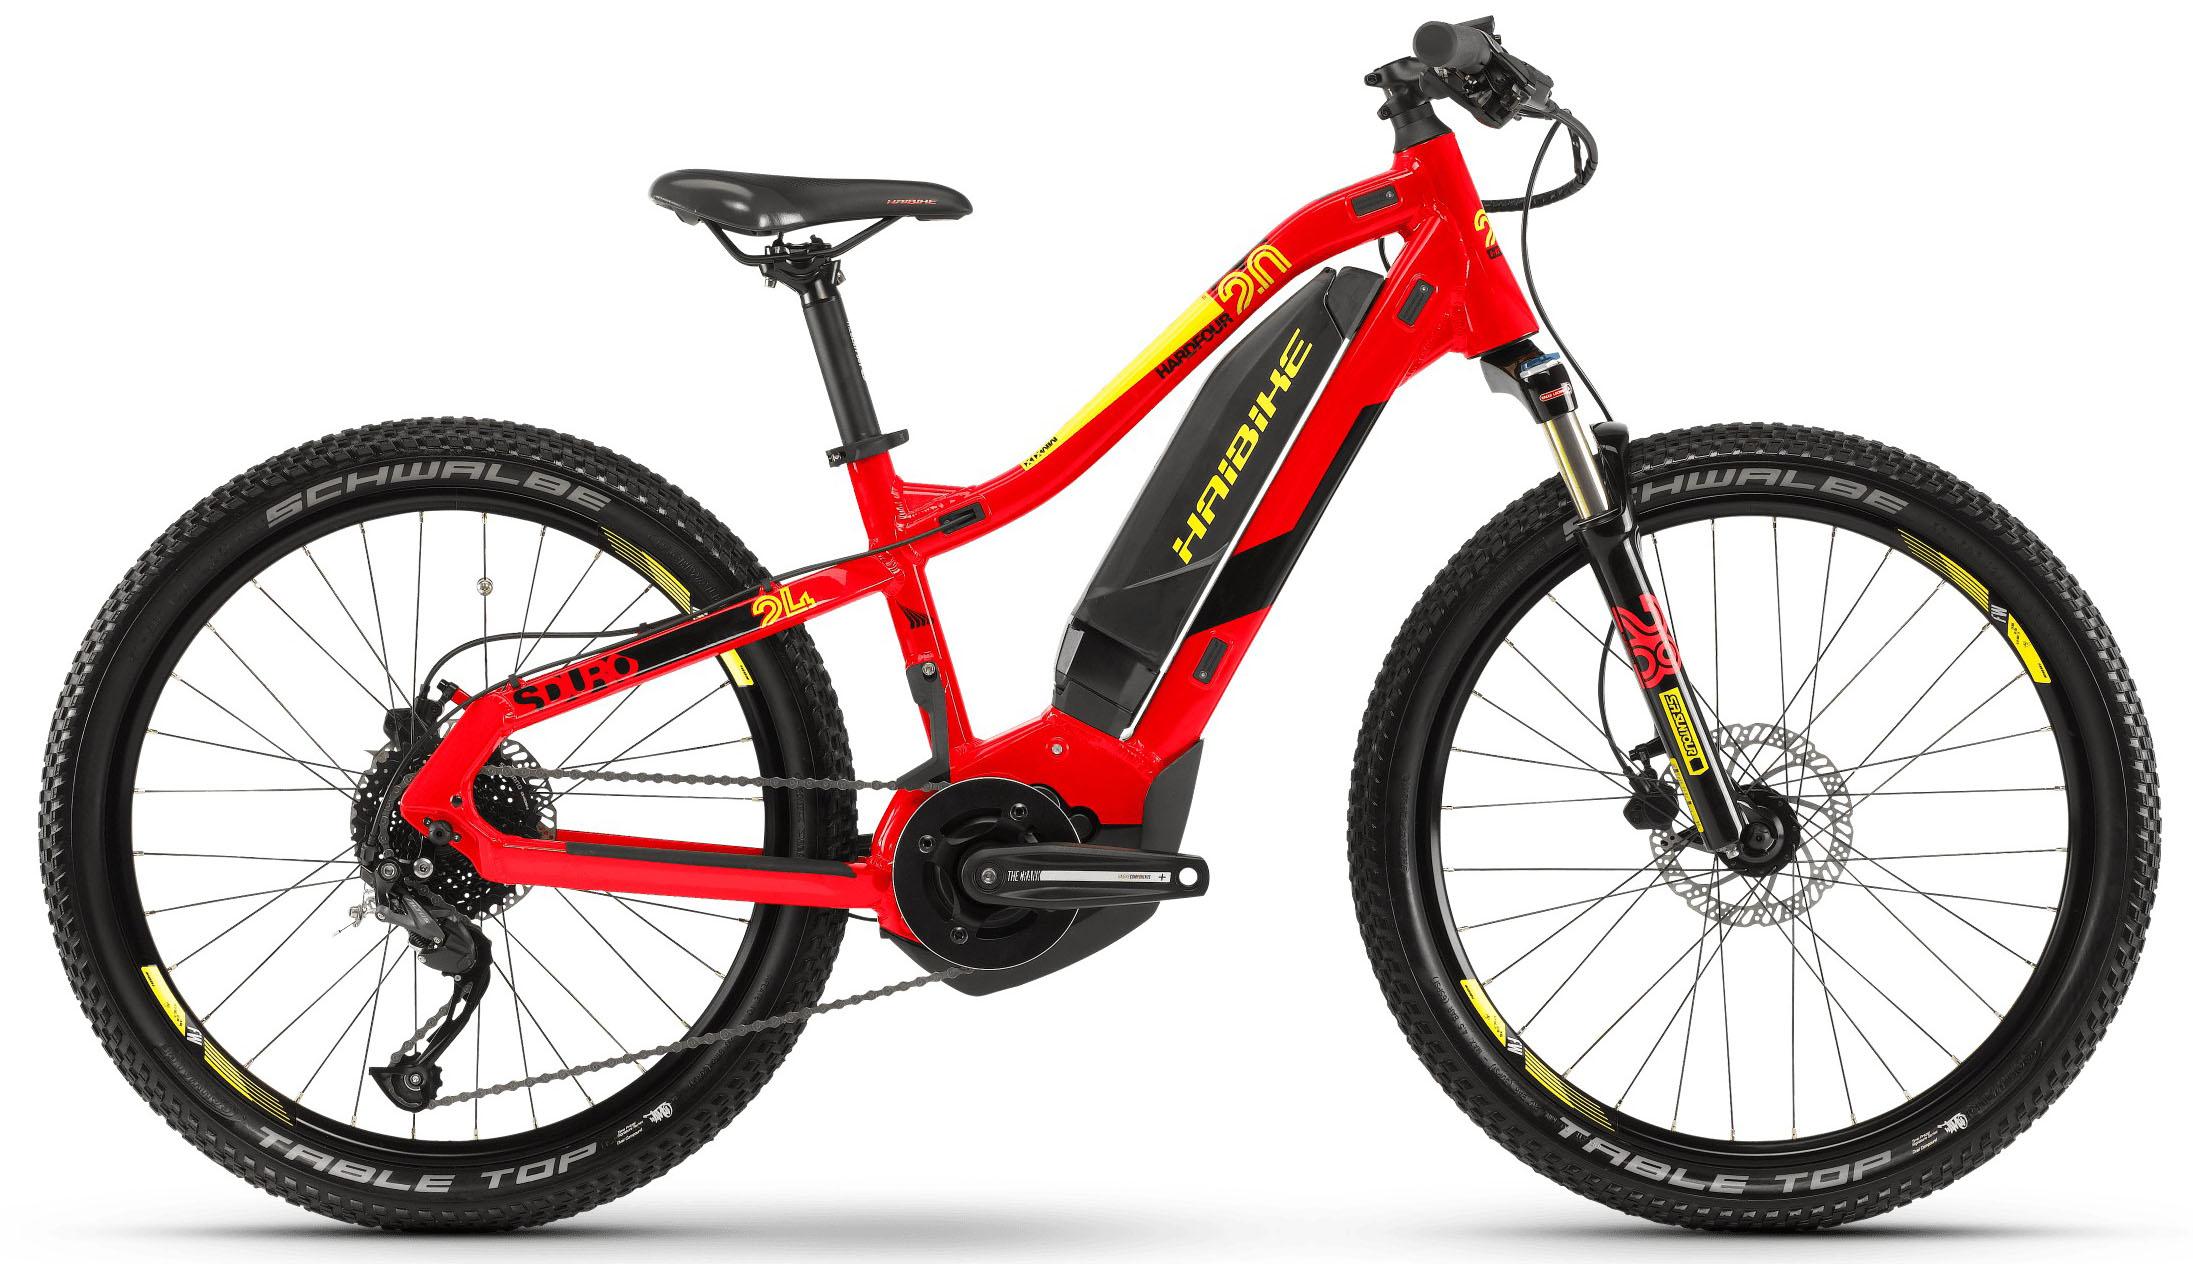 "Электровелосипед Haibike SDURO HardFour 2.0 (2019) размер рамы 34 см"" Красно-черно-желтый"